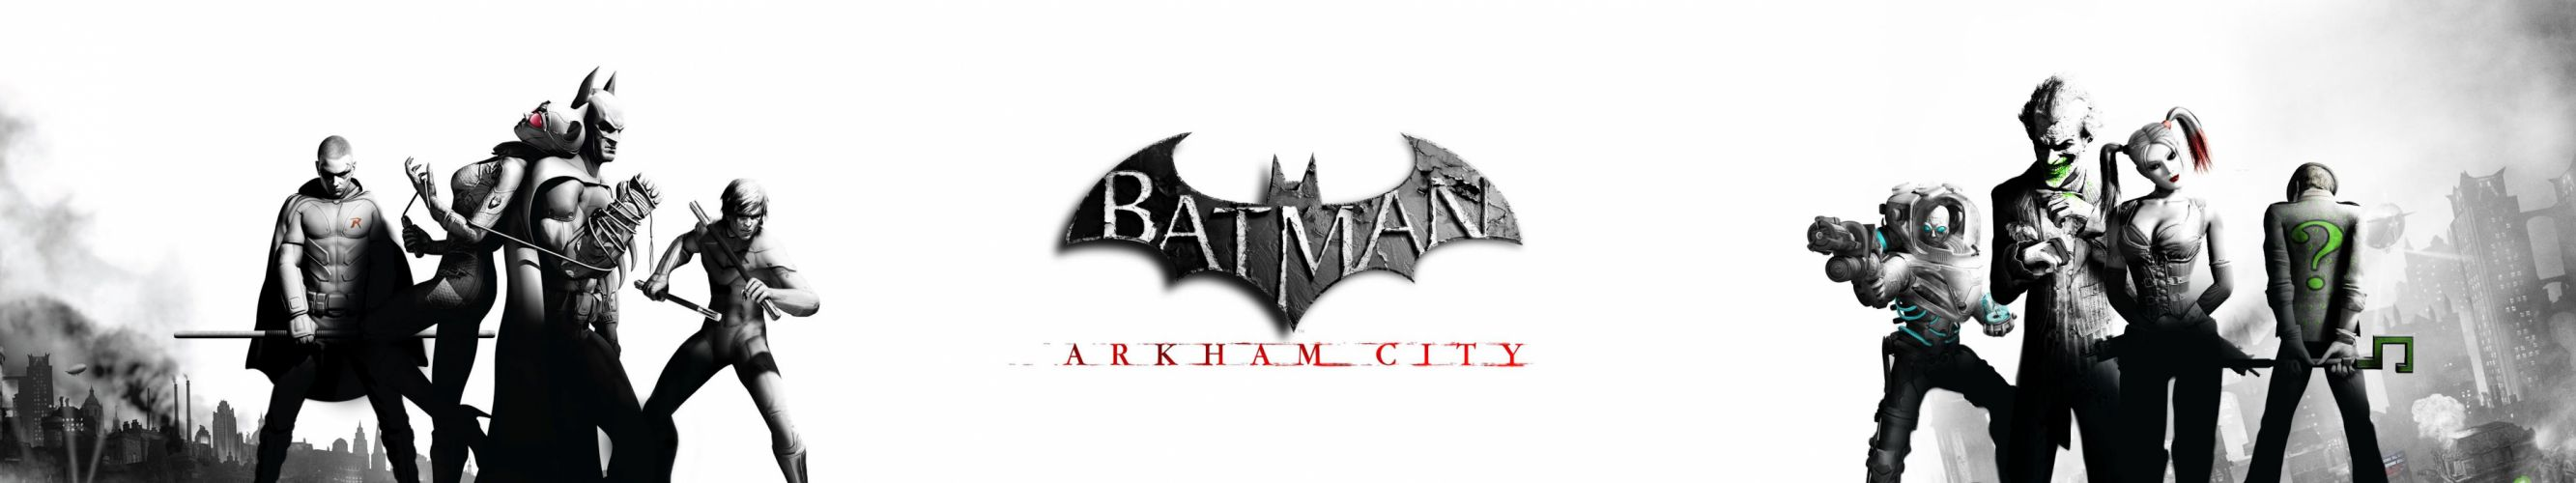 triple screen multiple monitors multi batman movie film arkham city wallpaper